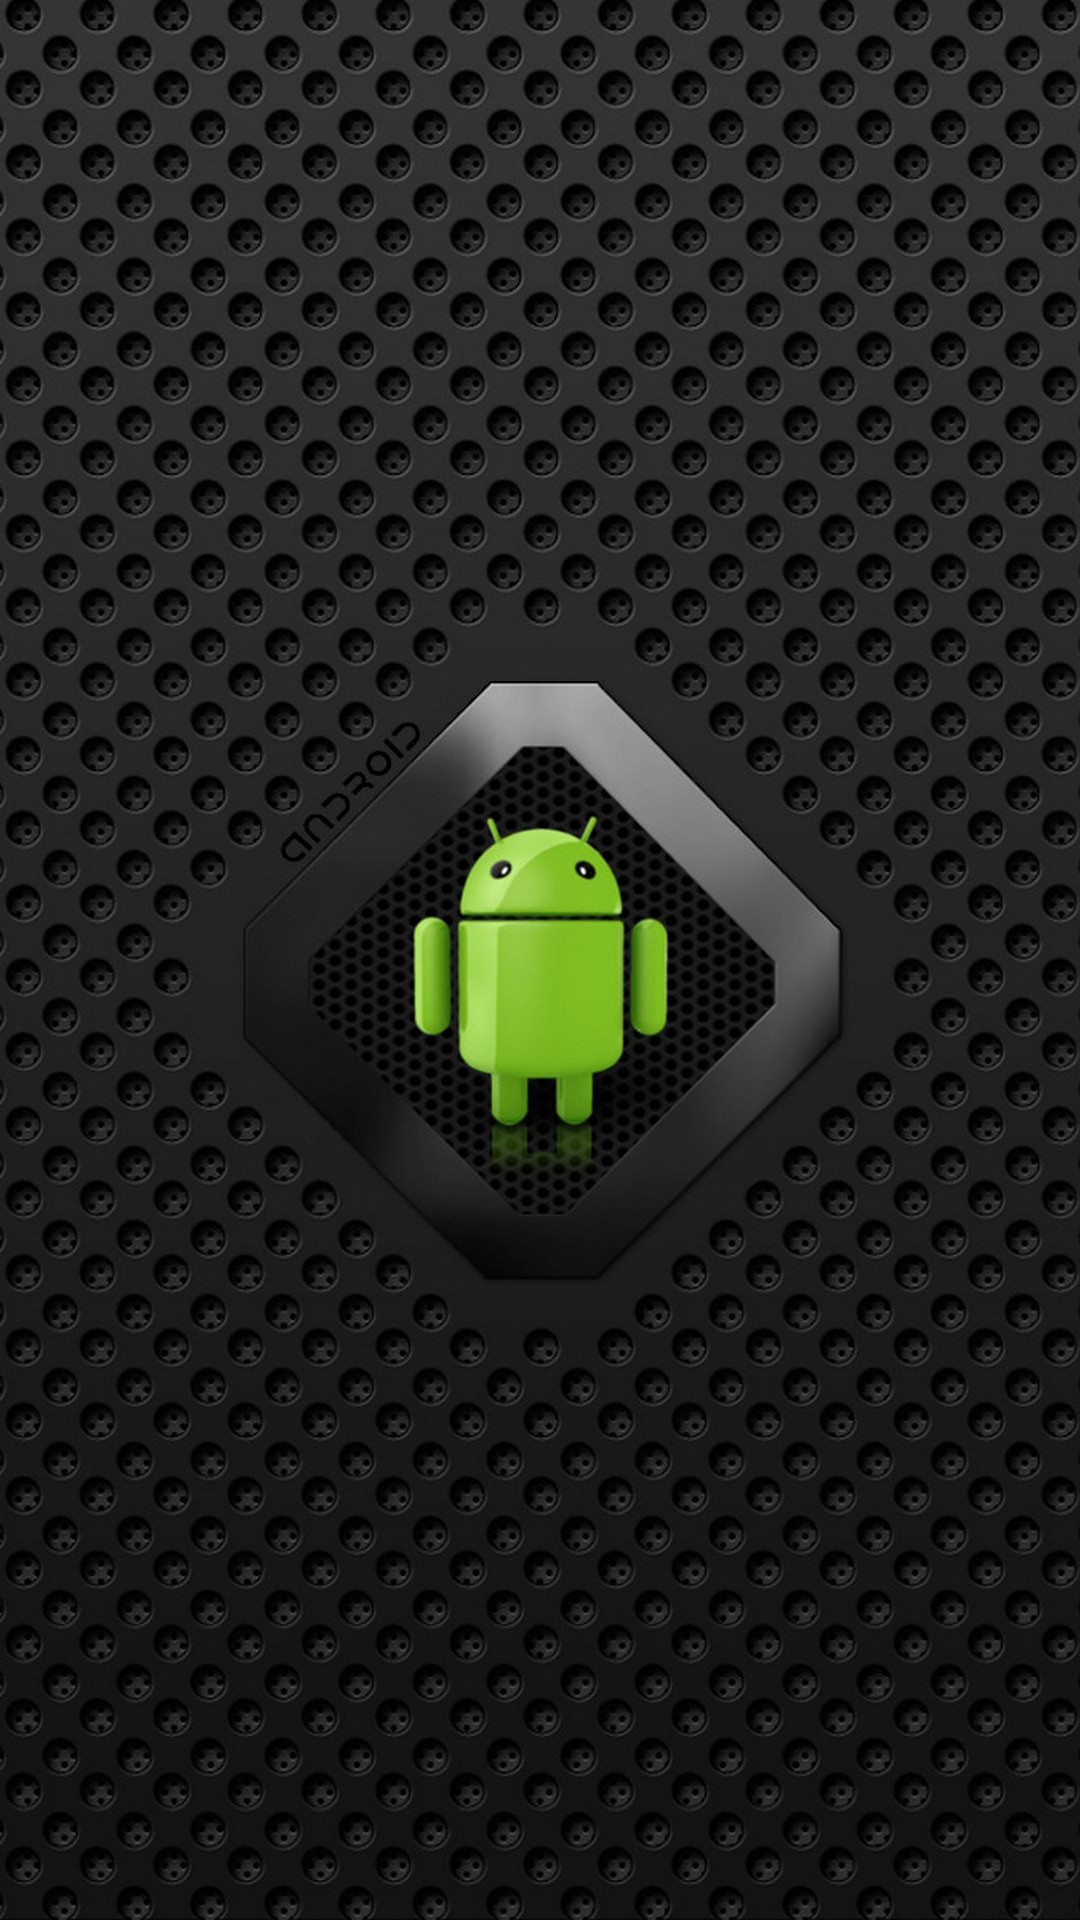 Android Robot Wallpaper 4k 768x1365 Download Hd Wallpaper Wallpapertip